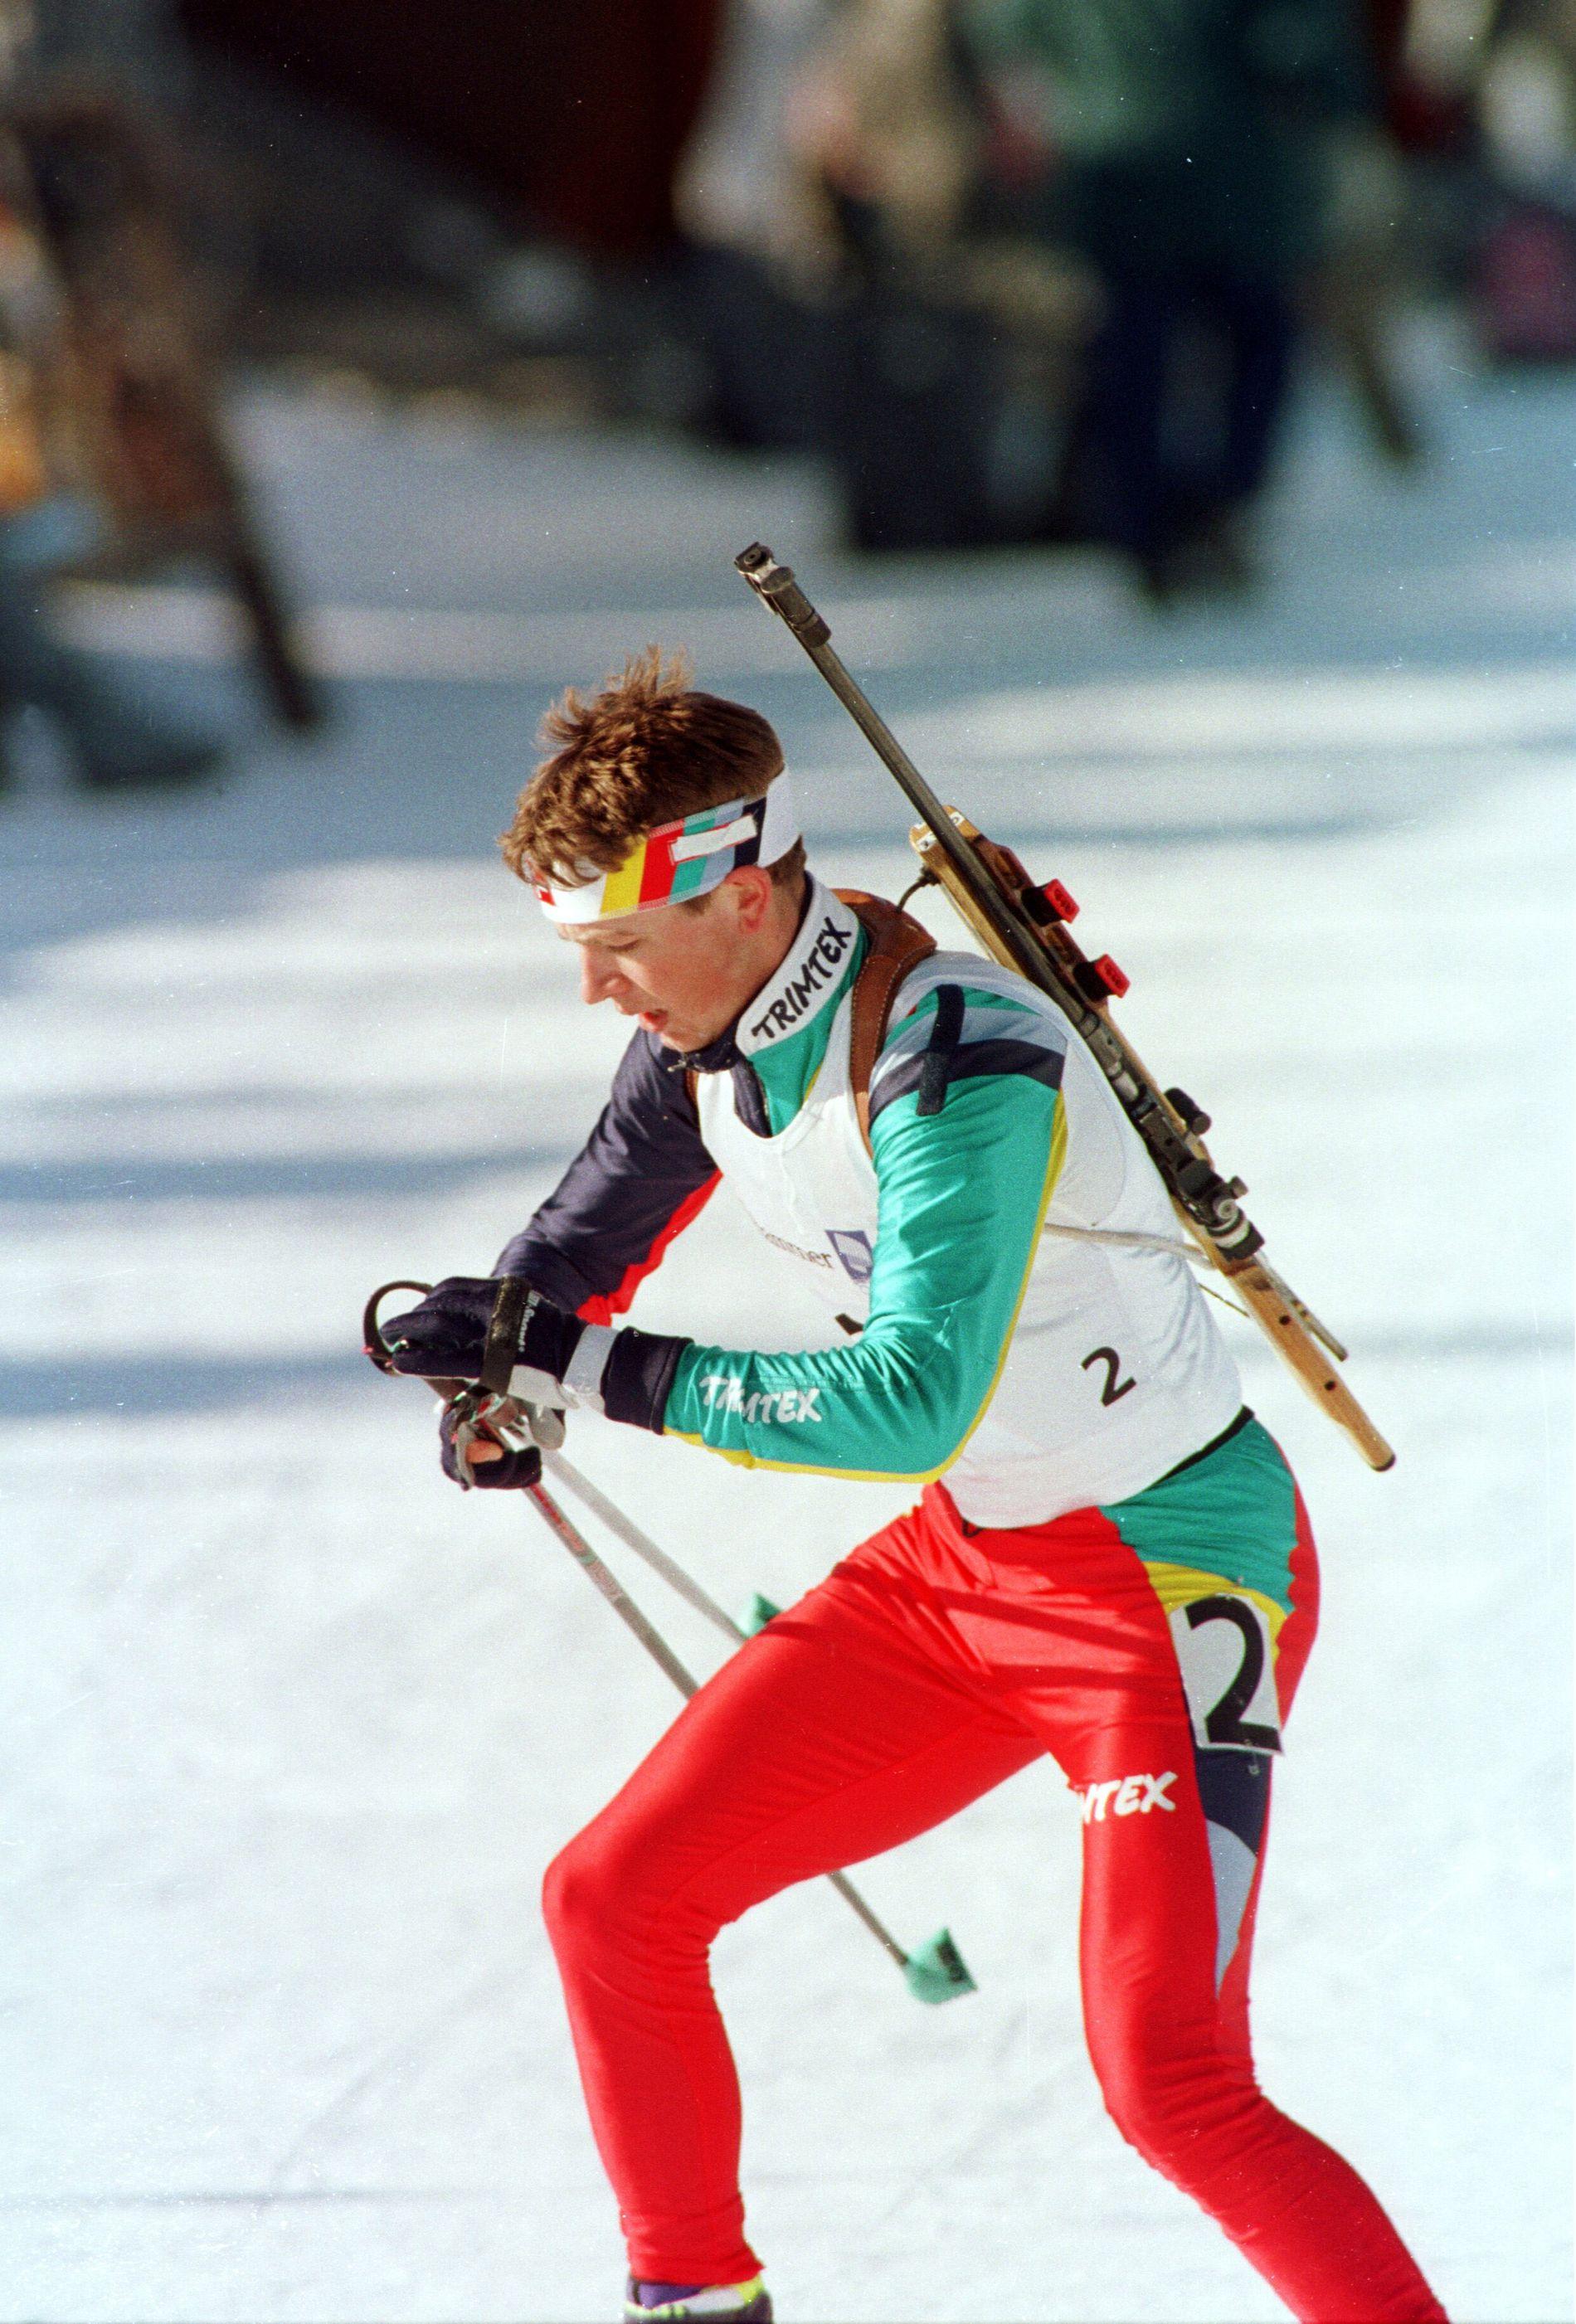 Ole Einar Bjørndalen var en overraskelse i OL-troppen i 1994. Her er en purung Bjørndalen i aksjon på sprinten, der han ble nummer 28.